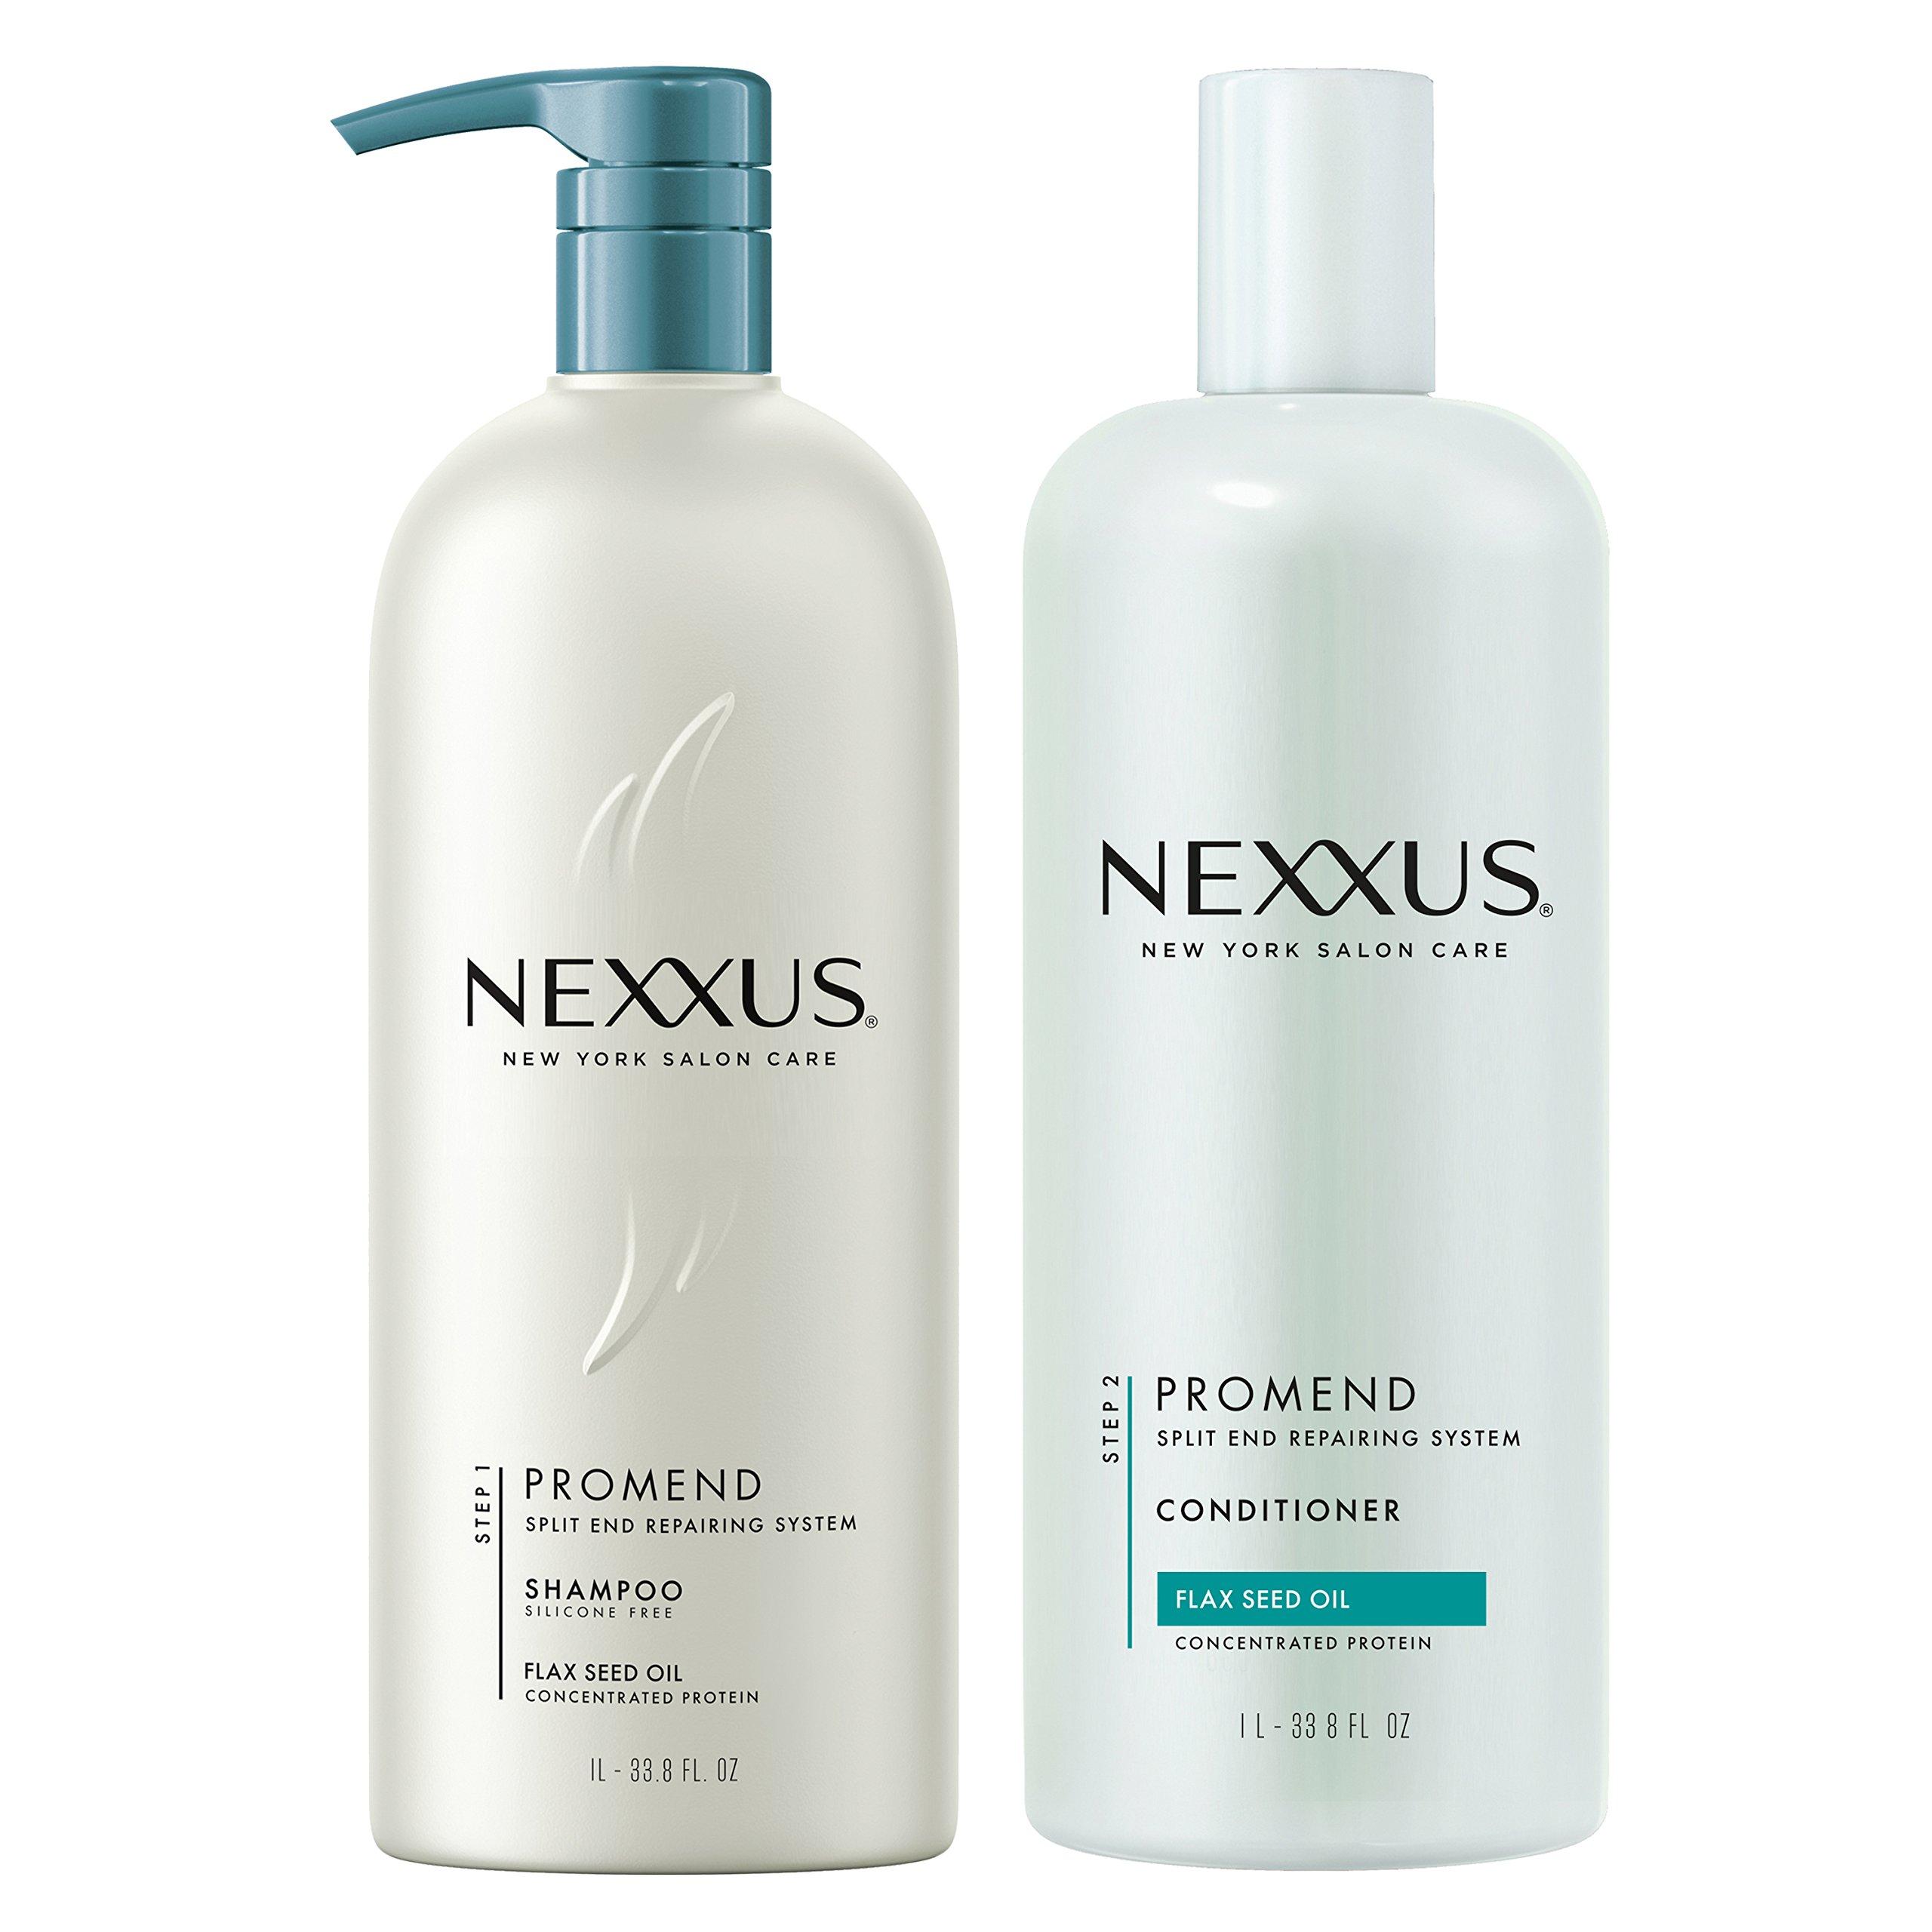 Amazon.com : Nexxus Pro Mend Overnight Treatment Crème, 1